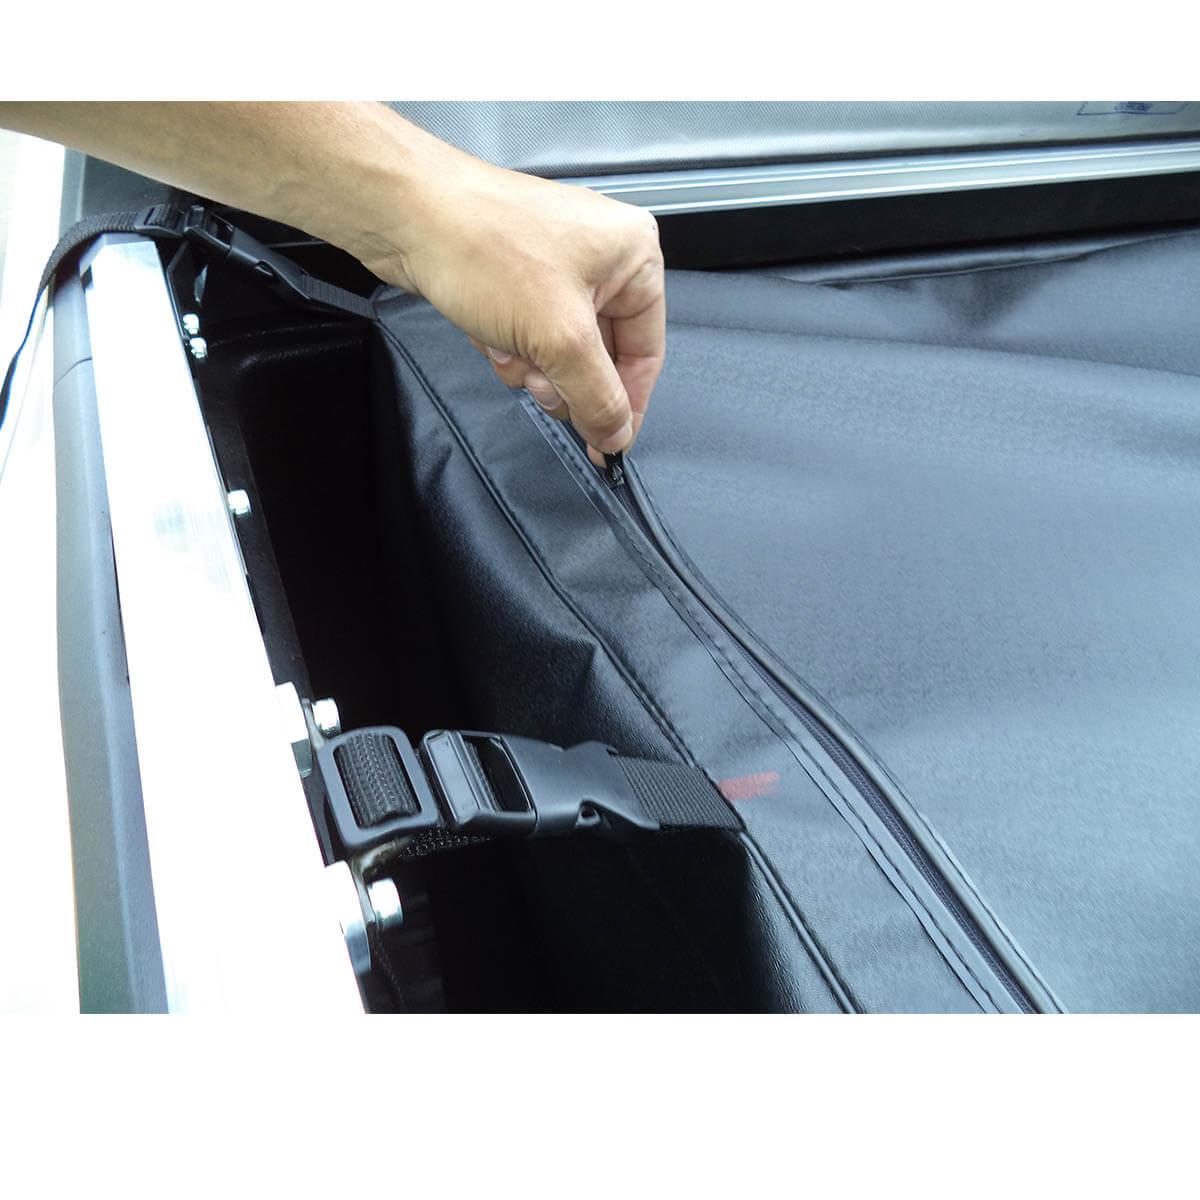 Bolsa caçamba estendida horizontal L200 Sport 2004 a 2007 ou L200 Outdoor 2007 a 2012